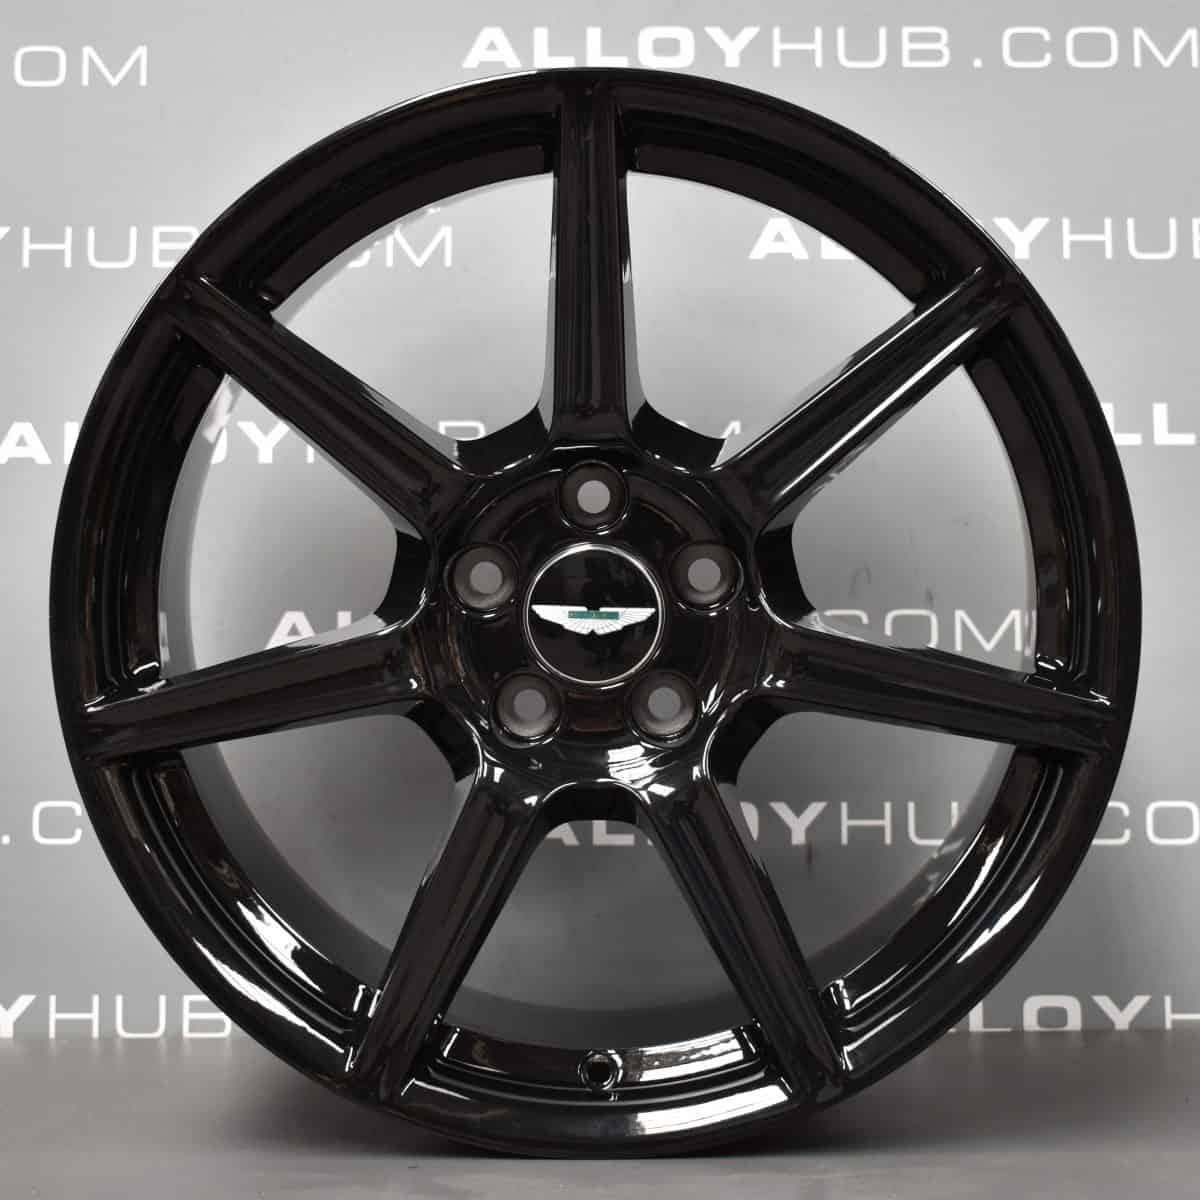 "Genuine Aston Martin Vantage 7 Spoke 19"" Inch Alloy Wheels with Gloss Black Finish 6G33-1007-FA, 6G33-1007-FB"